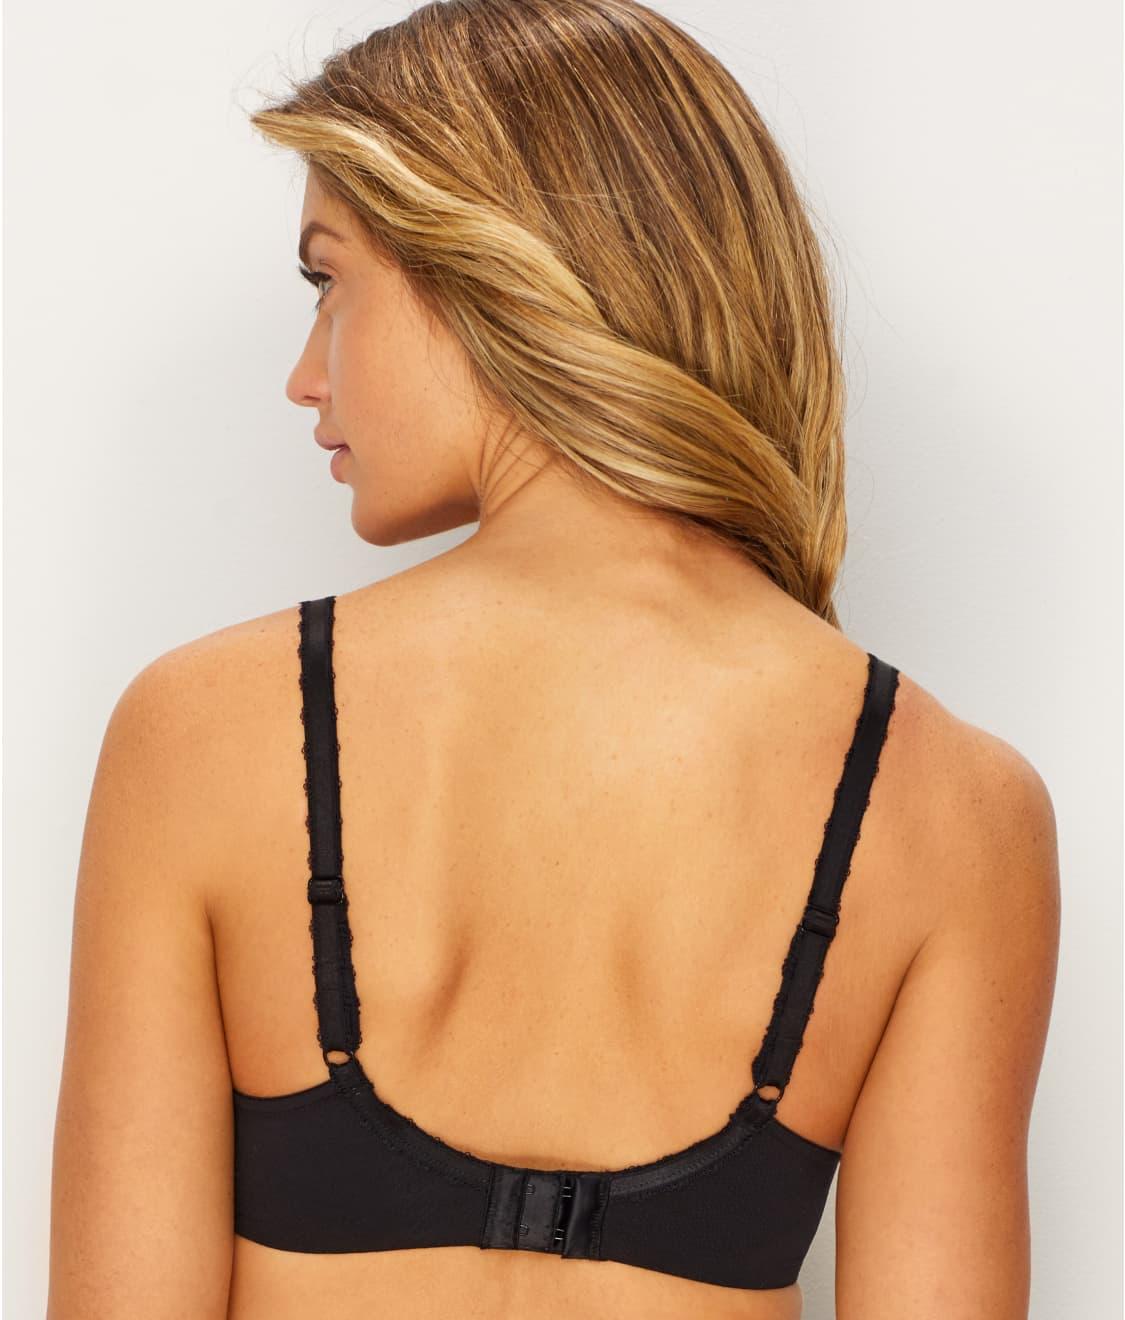 b47dabb720 See Top Tier Lace Bra in Black